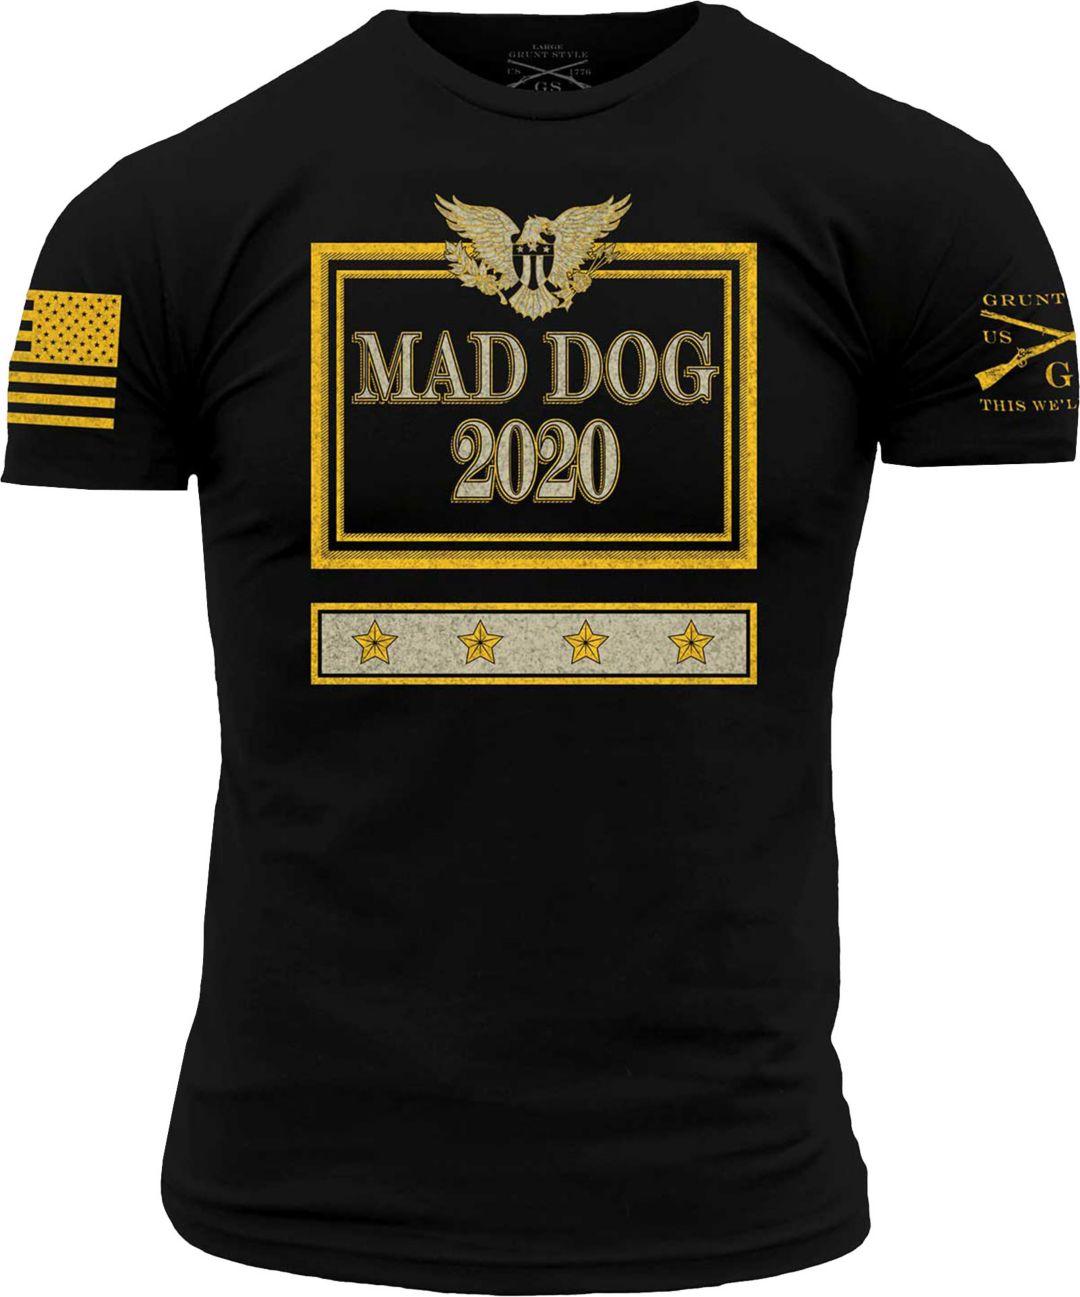 0405b8e6 Grunt Style Men's Mad Dog 2020 Short Sleeve T-Shirt. noImageFound. 1